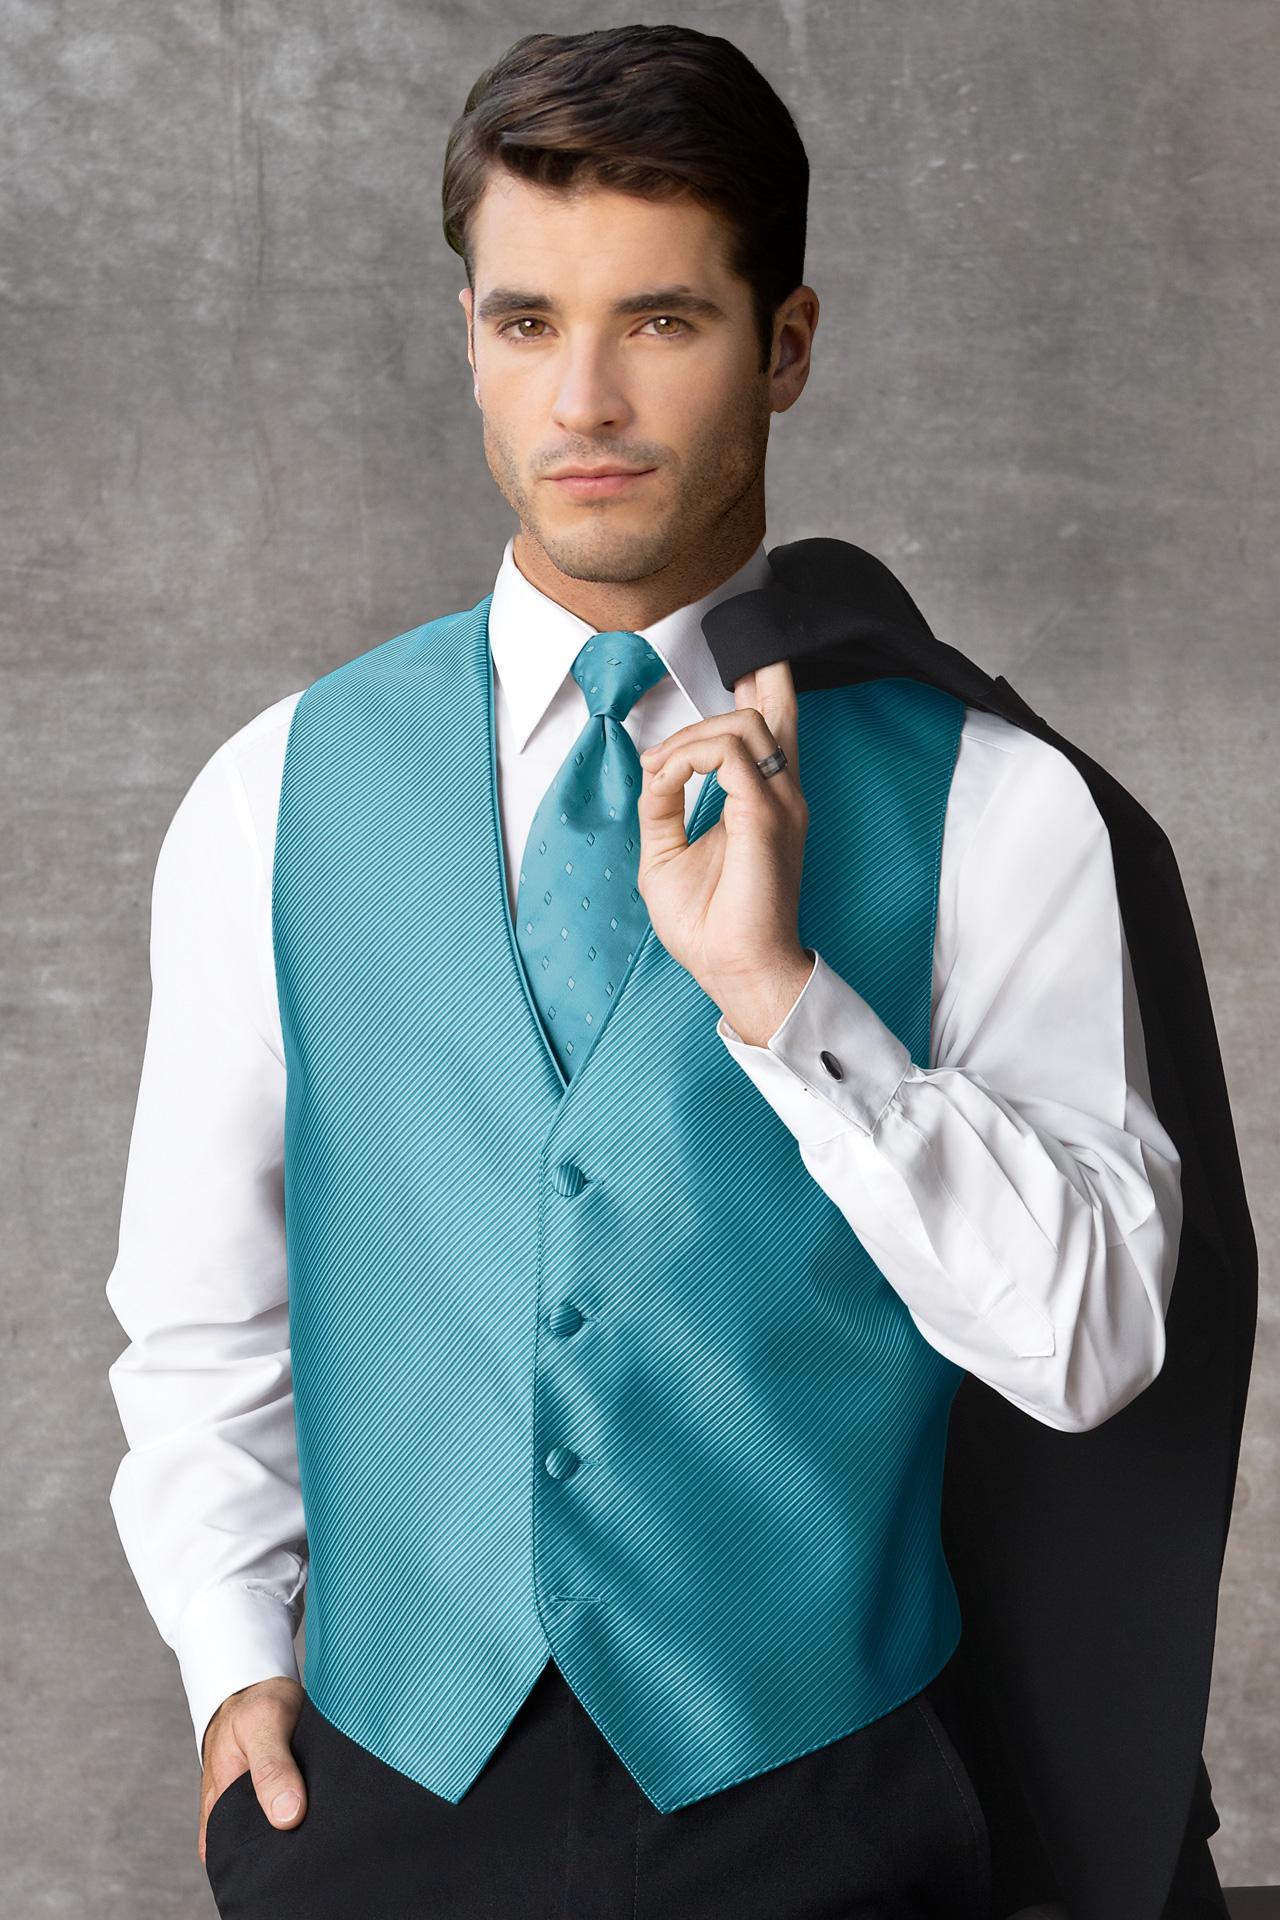 Synergy Dark Turquoise Vest   Jim\'s Formal Wear